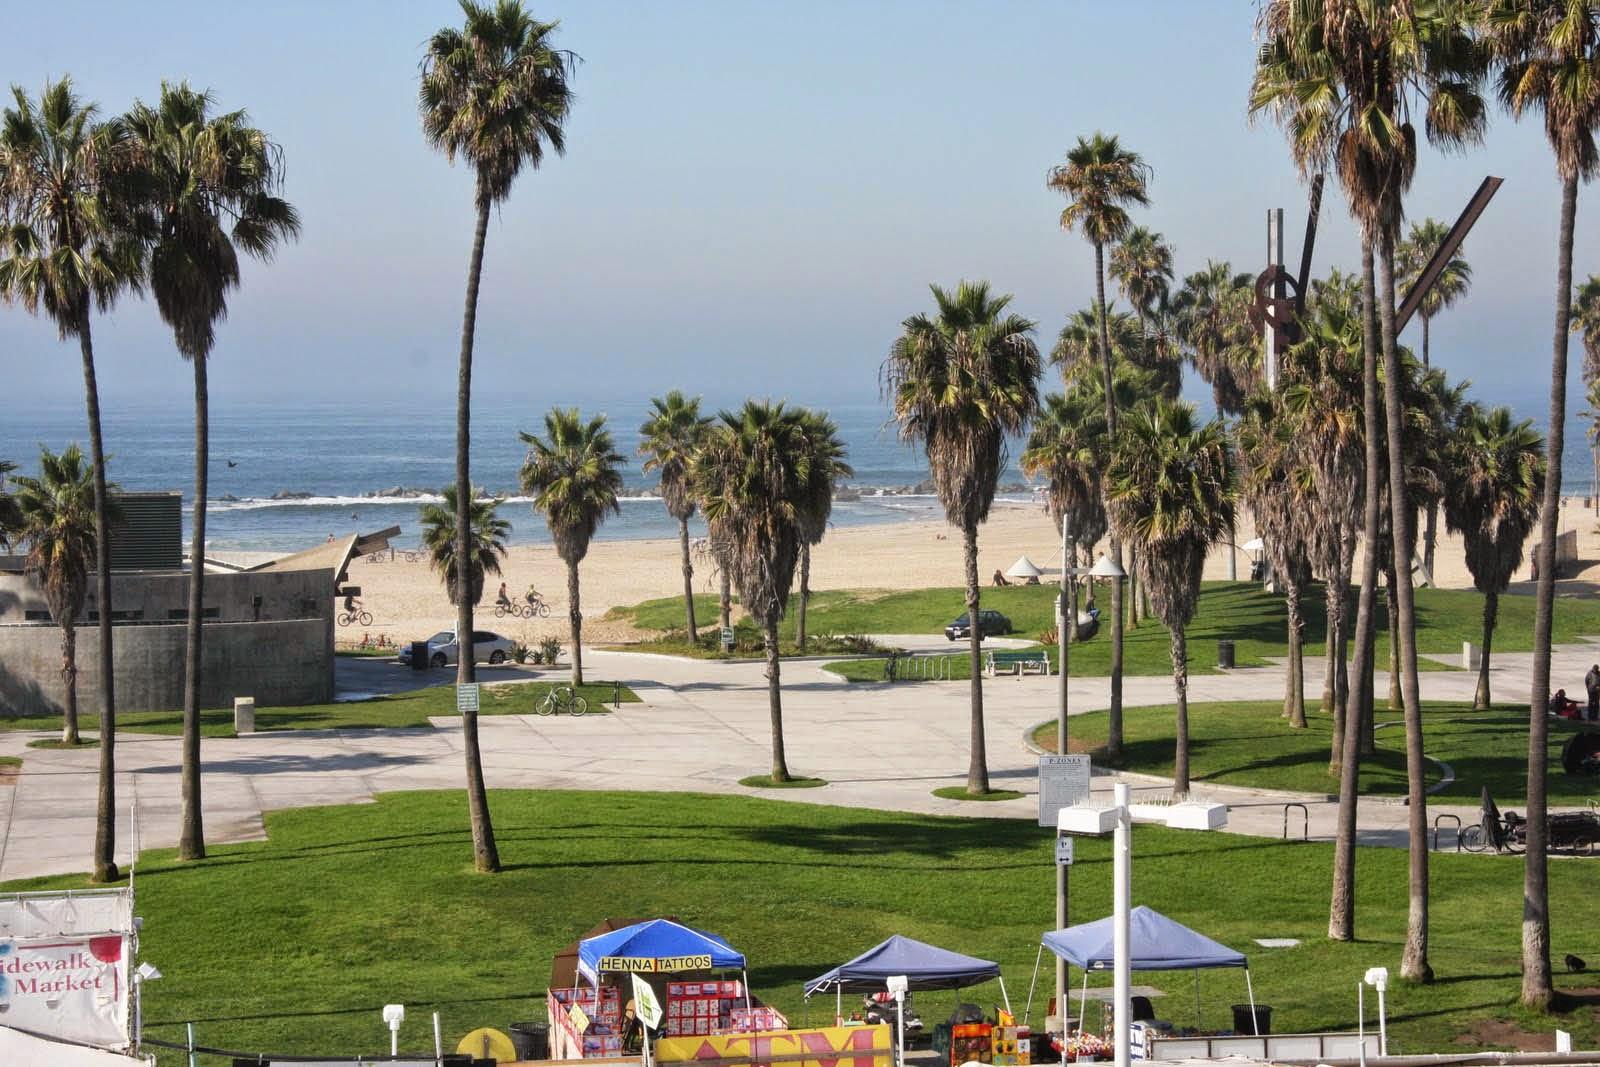 Venice beach California Windows wallpaper | Wallpaper view